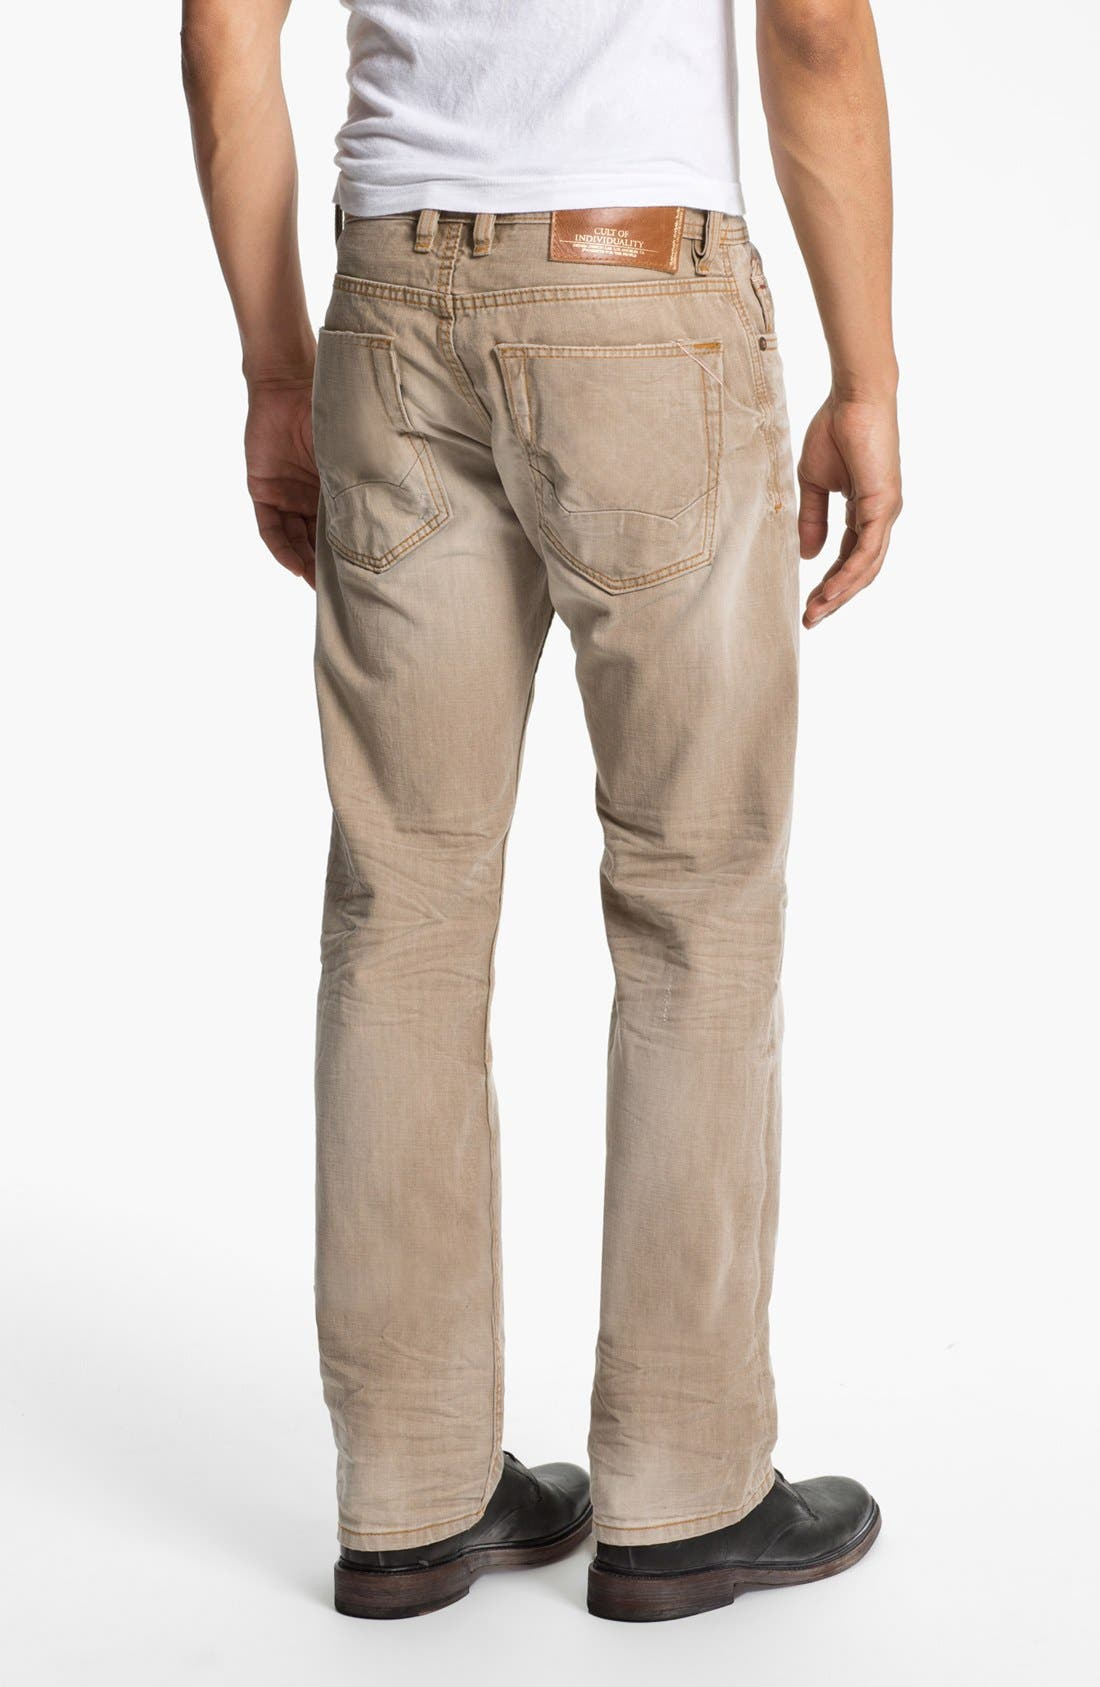 Alternate Image 1 Selected - Cult of Individuality 'Rebel' Straight Leg Jeans (Desert)